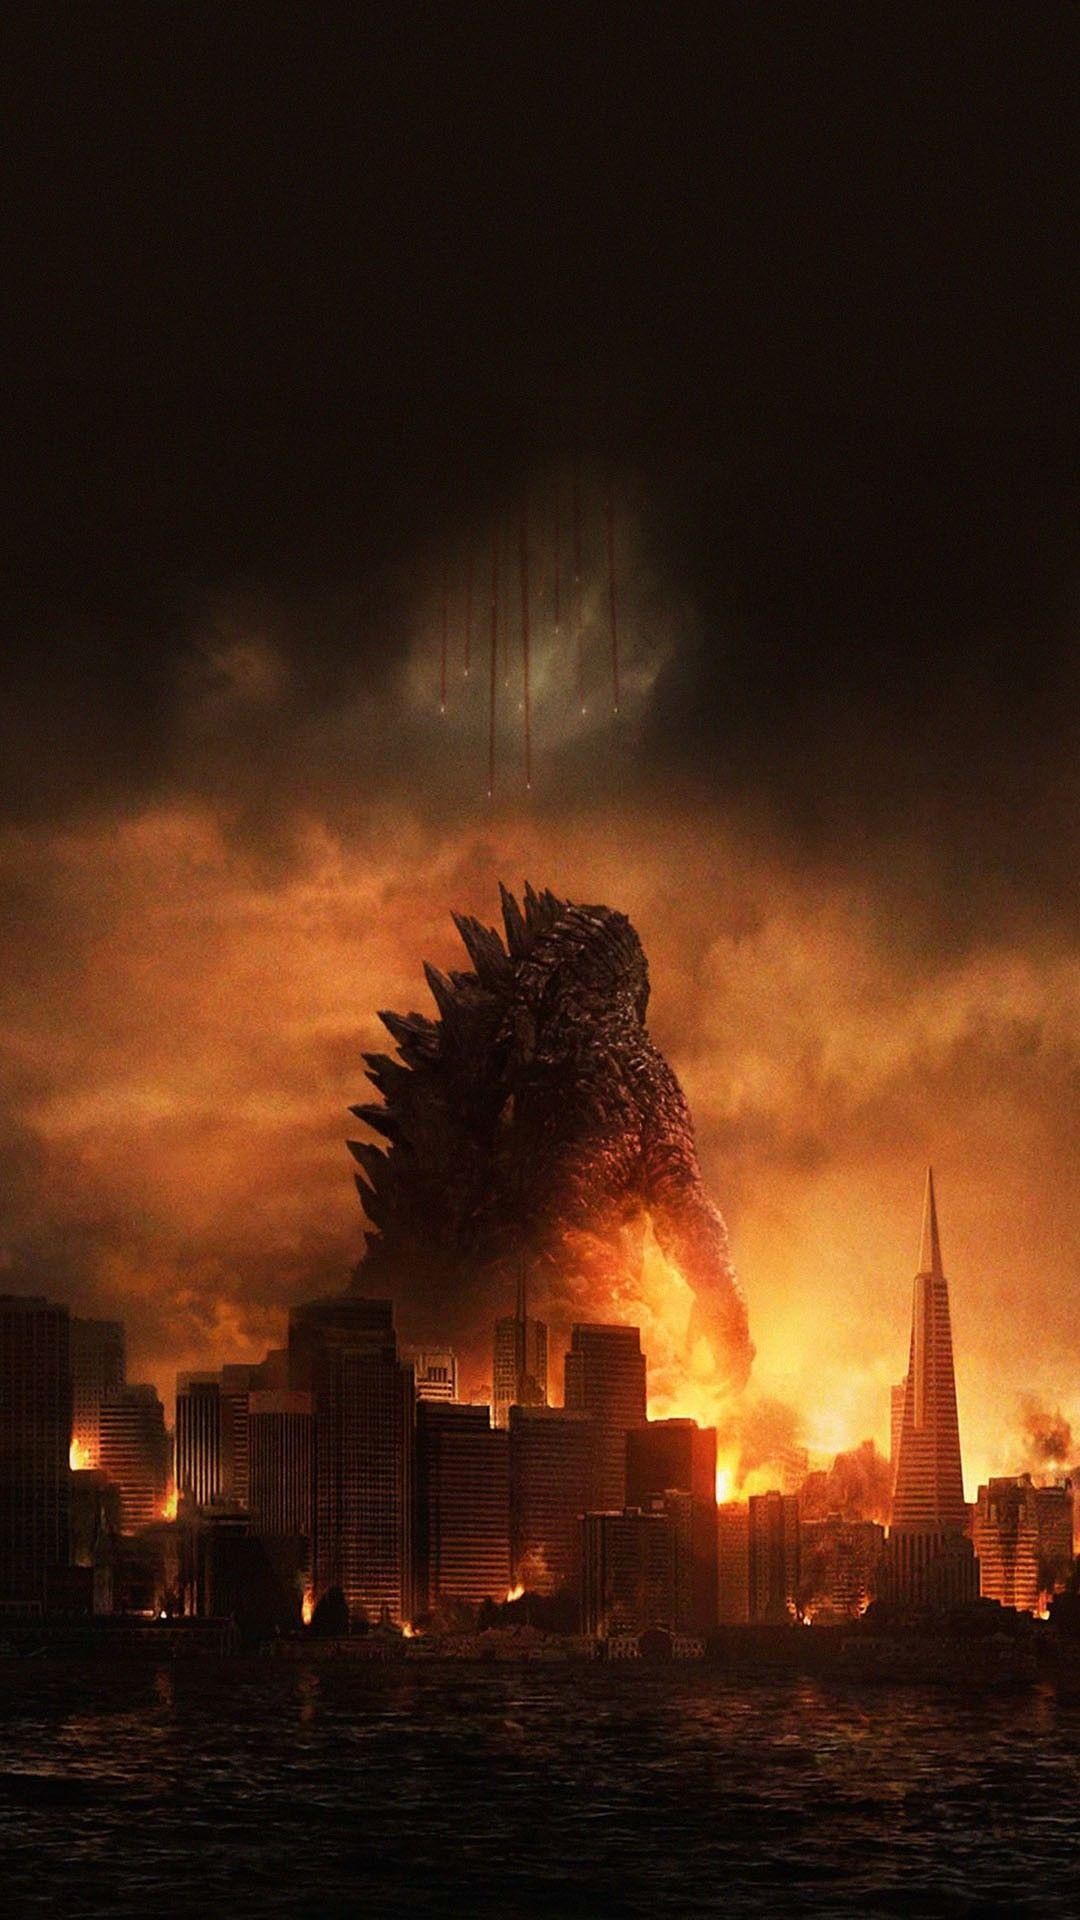 Godzilla Destroying City Movie Poster Smartphone Wallpaper And Lockscreen Hd Godzilla Wallpaper Godzilla Android Wallpaper